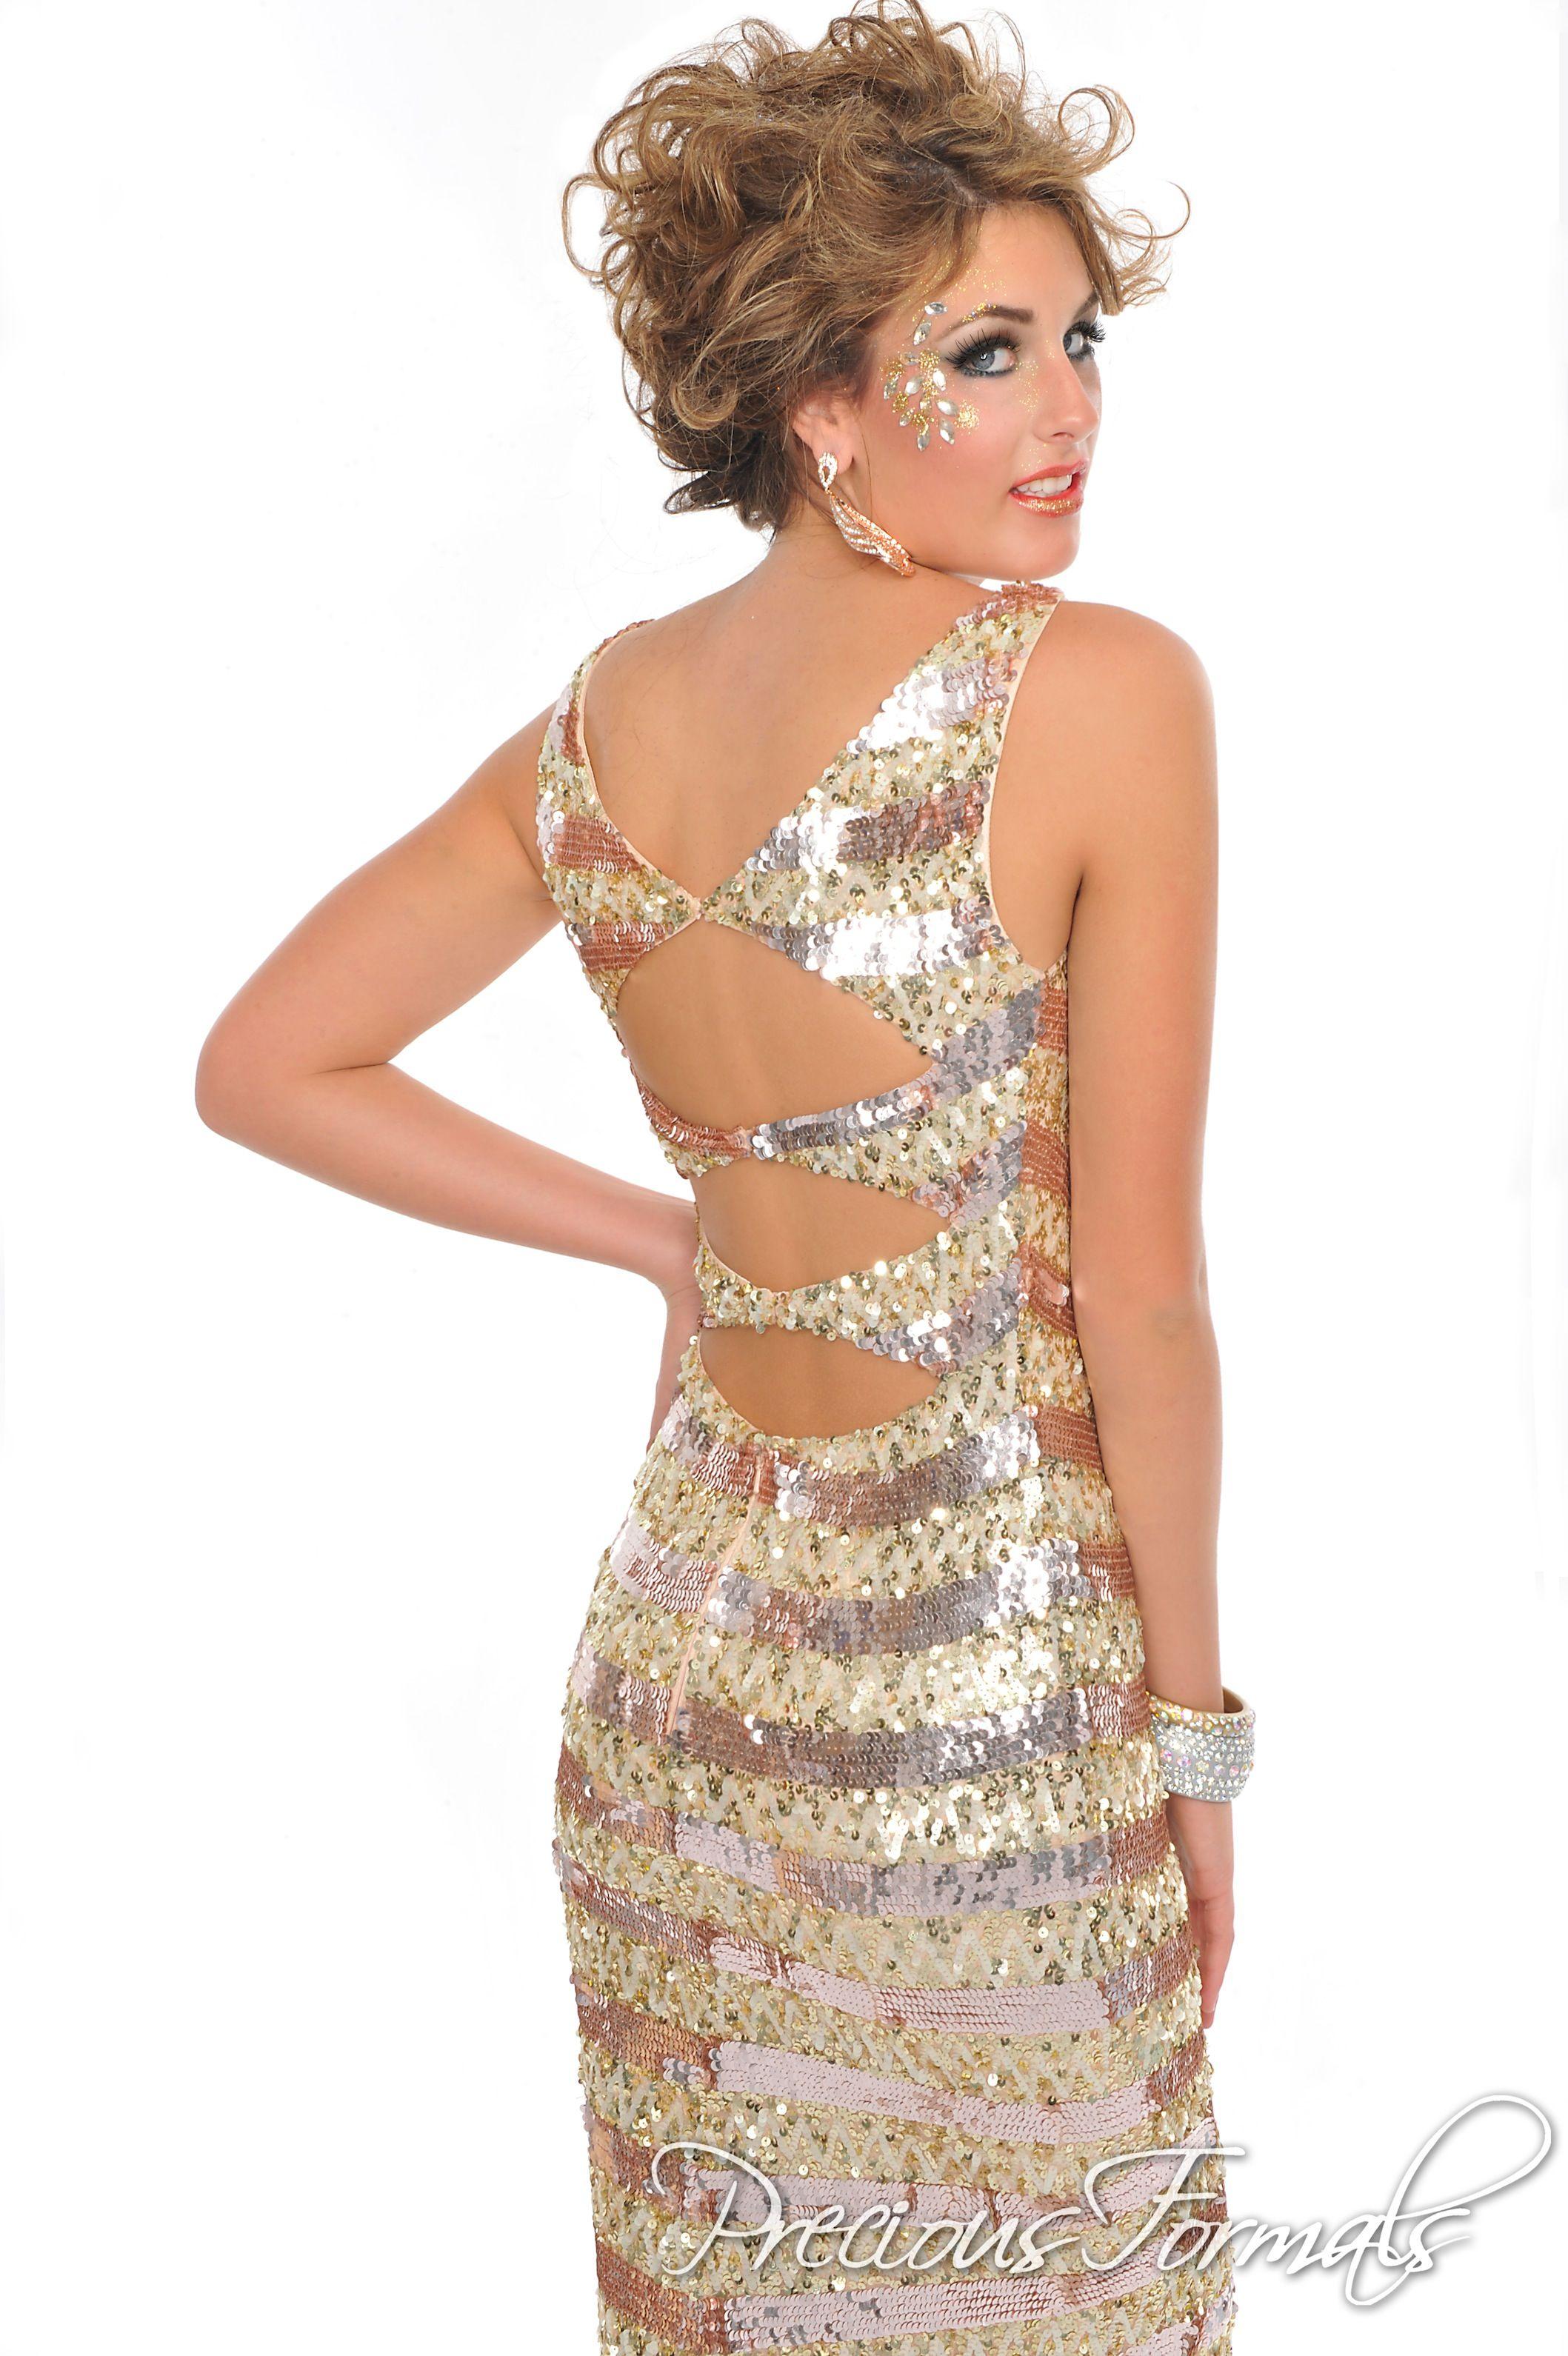 Precious formals in nudegoldcopper precious formals prom dresses